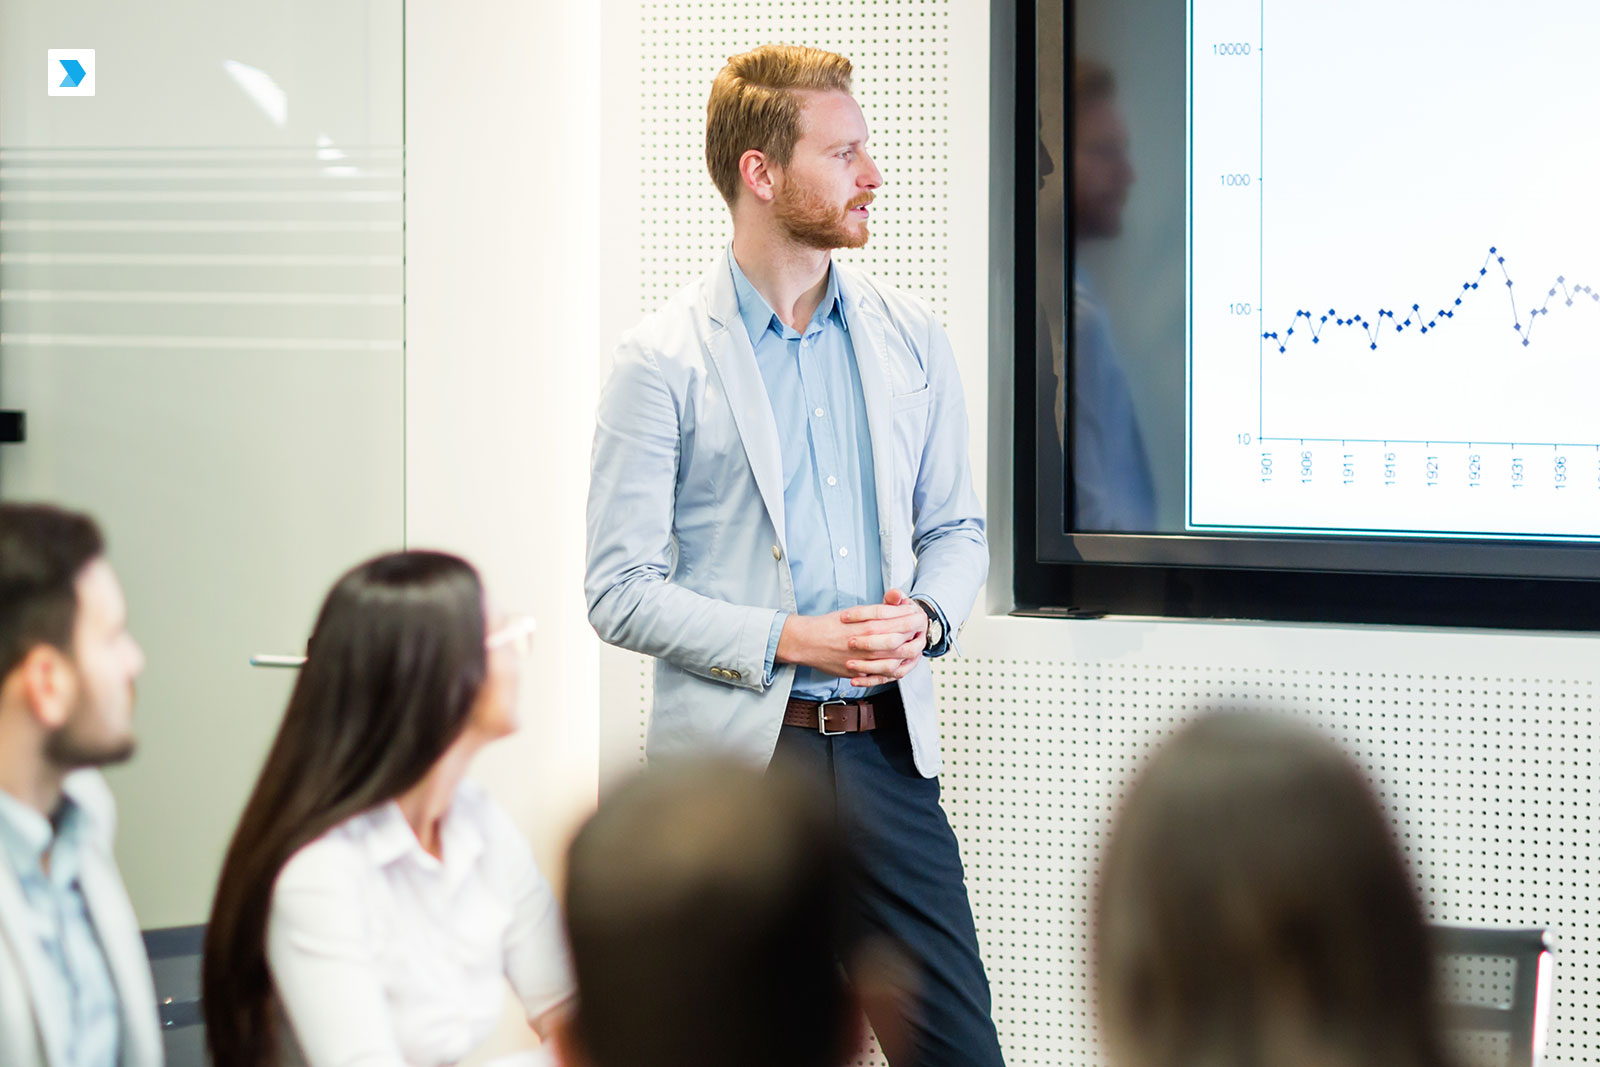 Traits of a Successful Digital Marketing Professional